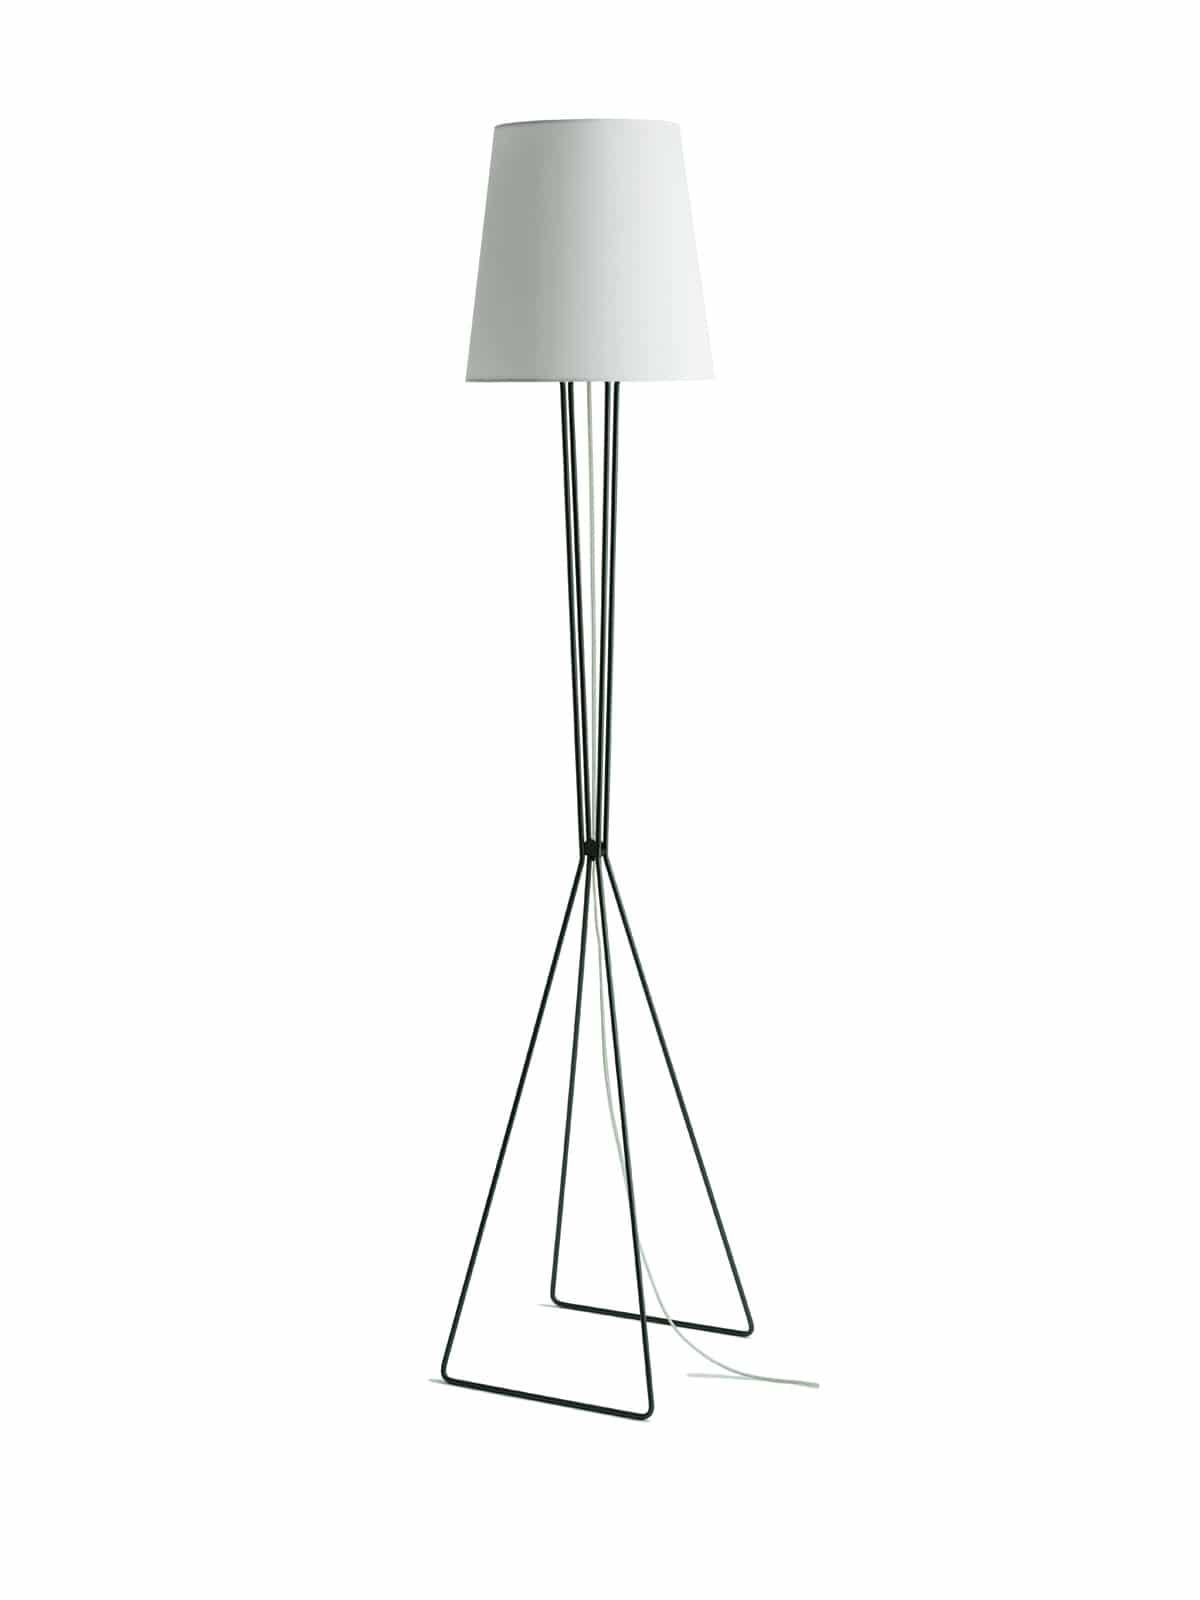 annie led lampen leuchten designerleuchten online berlin. Black Bedroom Furniture Sets. Home Design Ideas